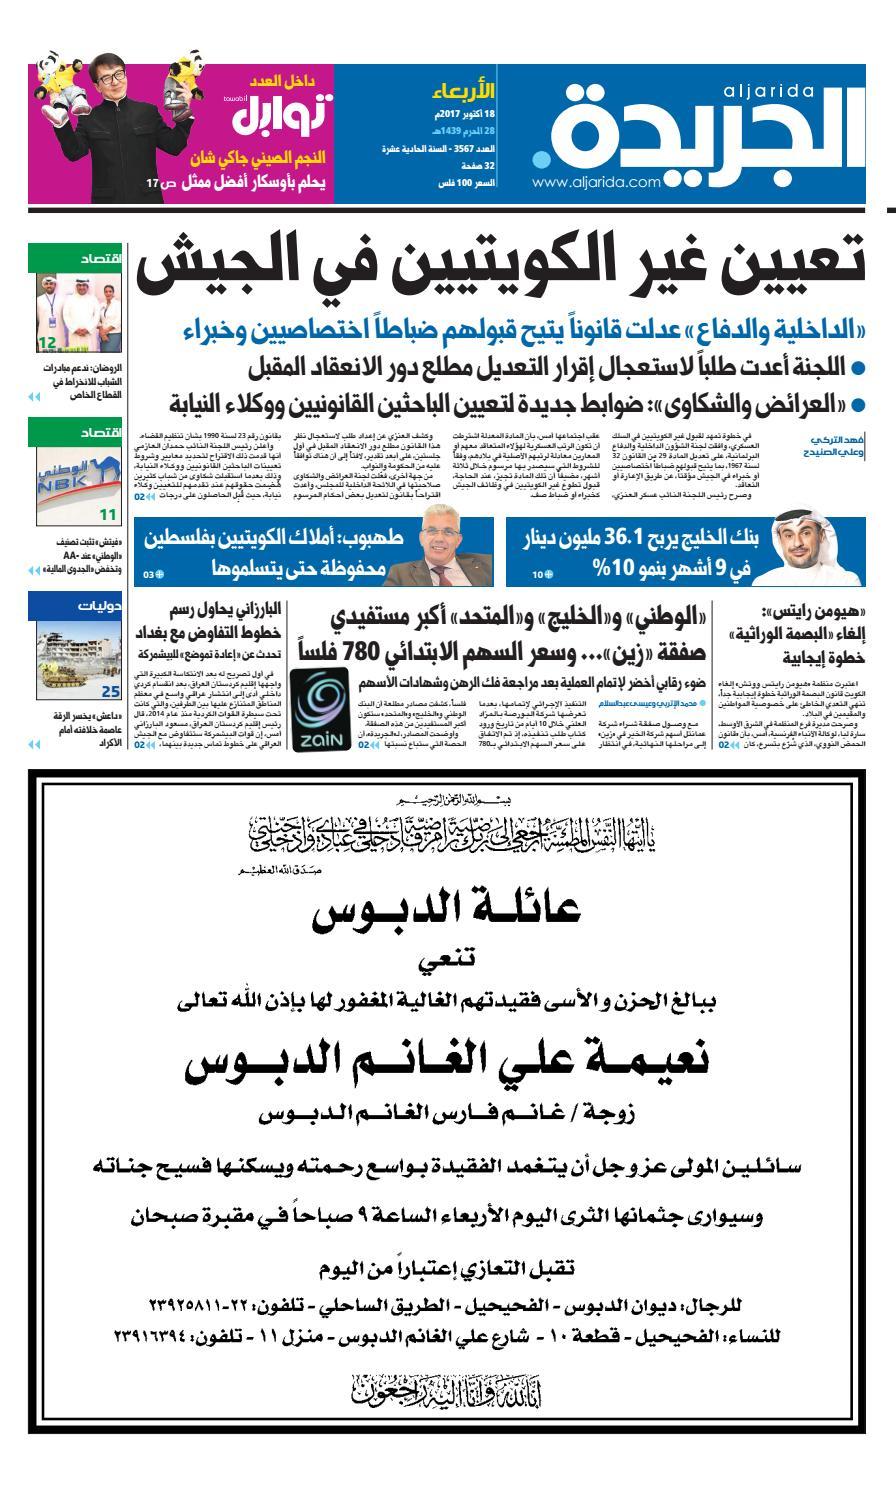 7a5e8c0725a57 عدد الجريدة الأربعاء 18 أكتوبر 2017 by Aljarida Newspaper - issuu